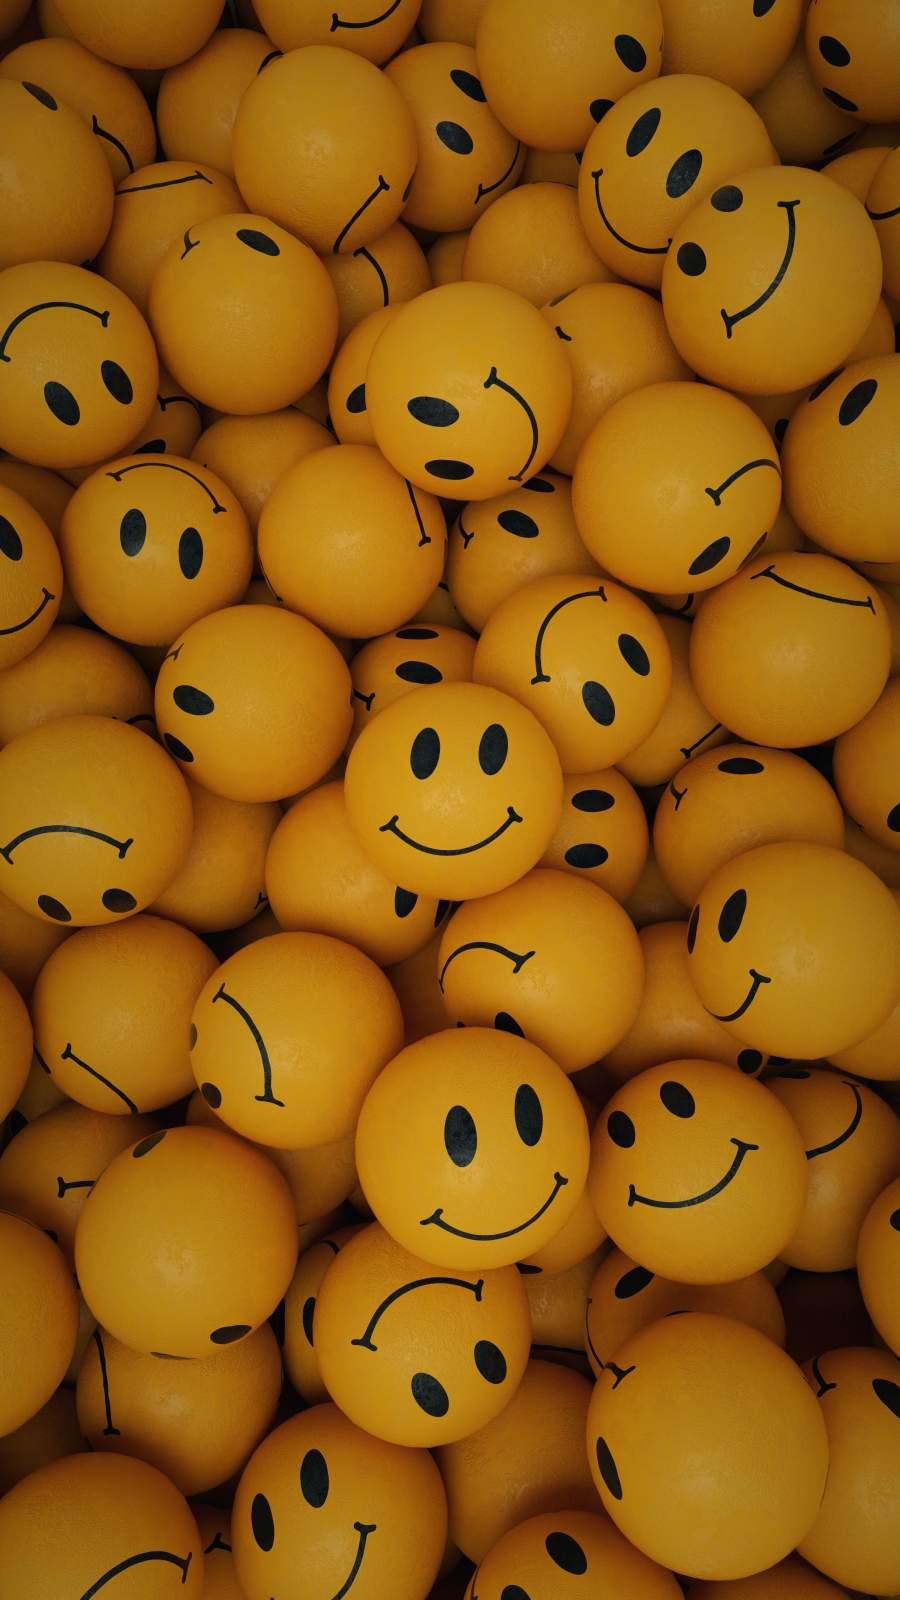 Smile Balls iPhone Wallpaper